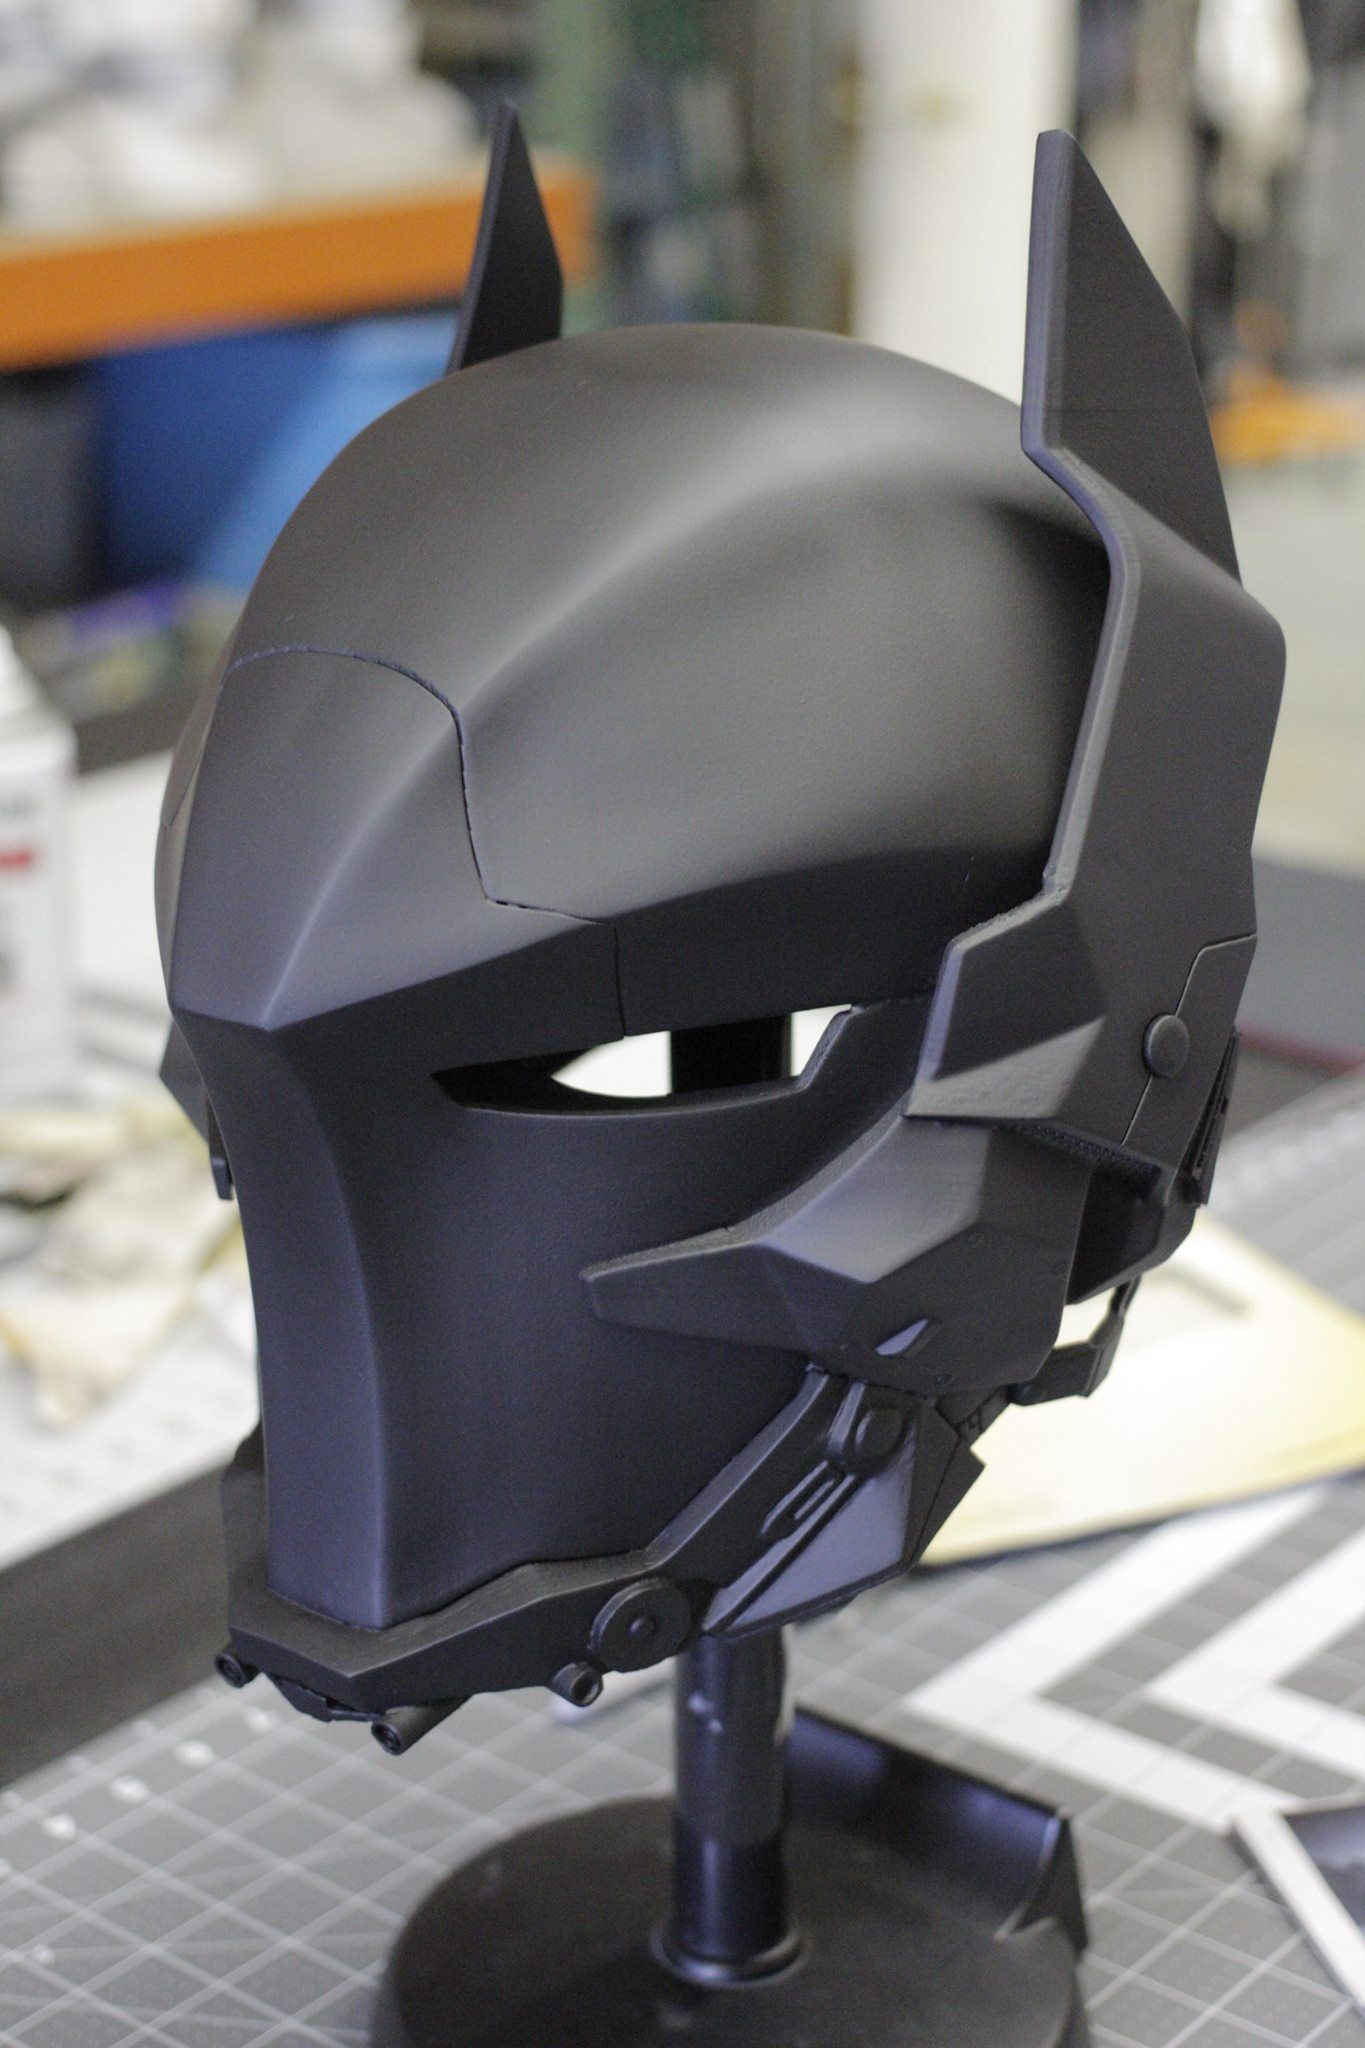 картинки шлема бэтмена впечатляющее место, идеально